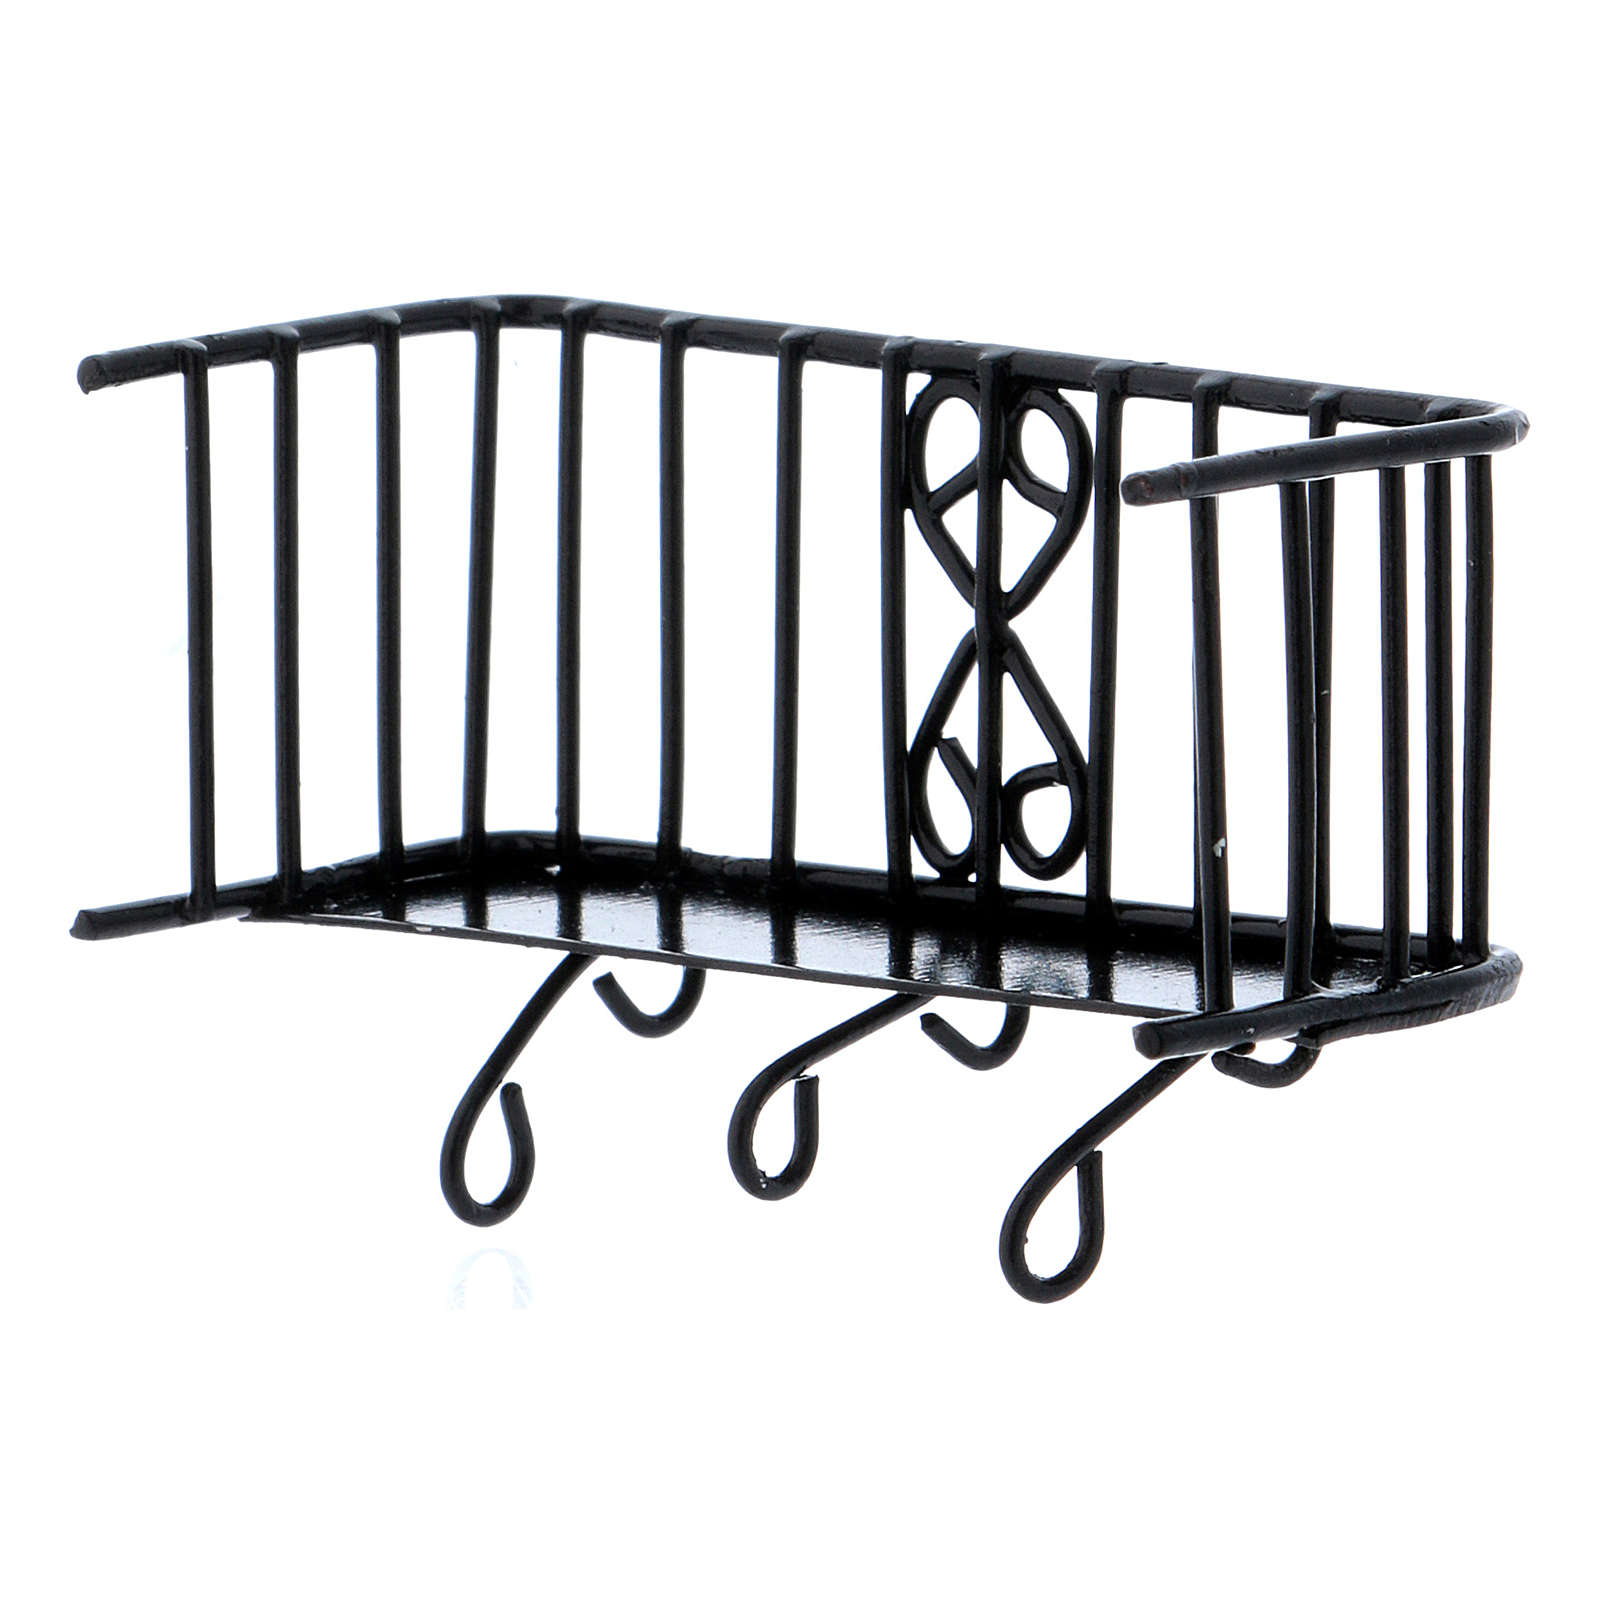 Balcone in ferro 3x5x2,5 cm 4